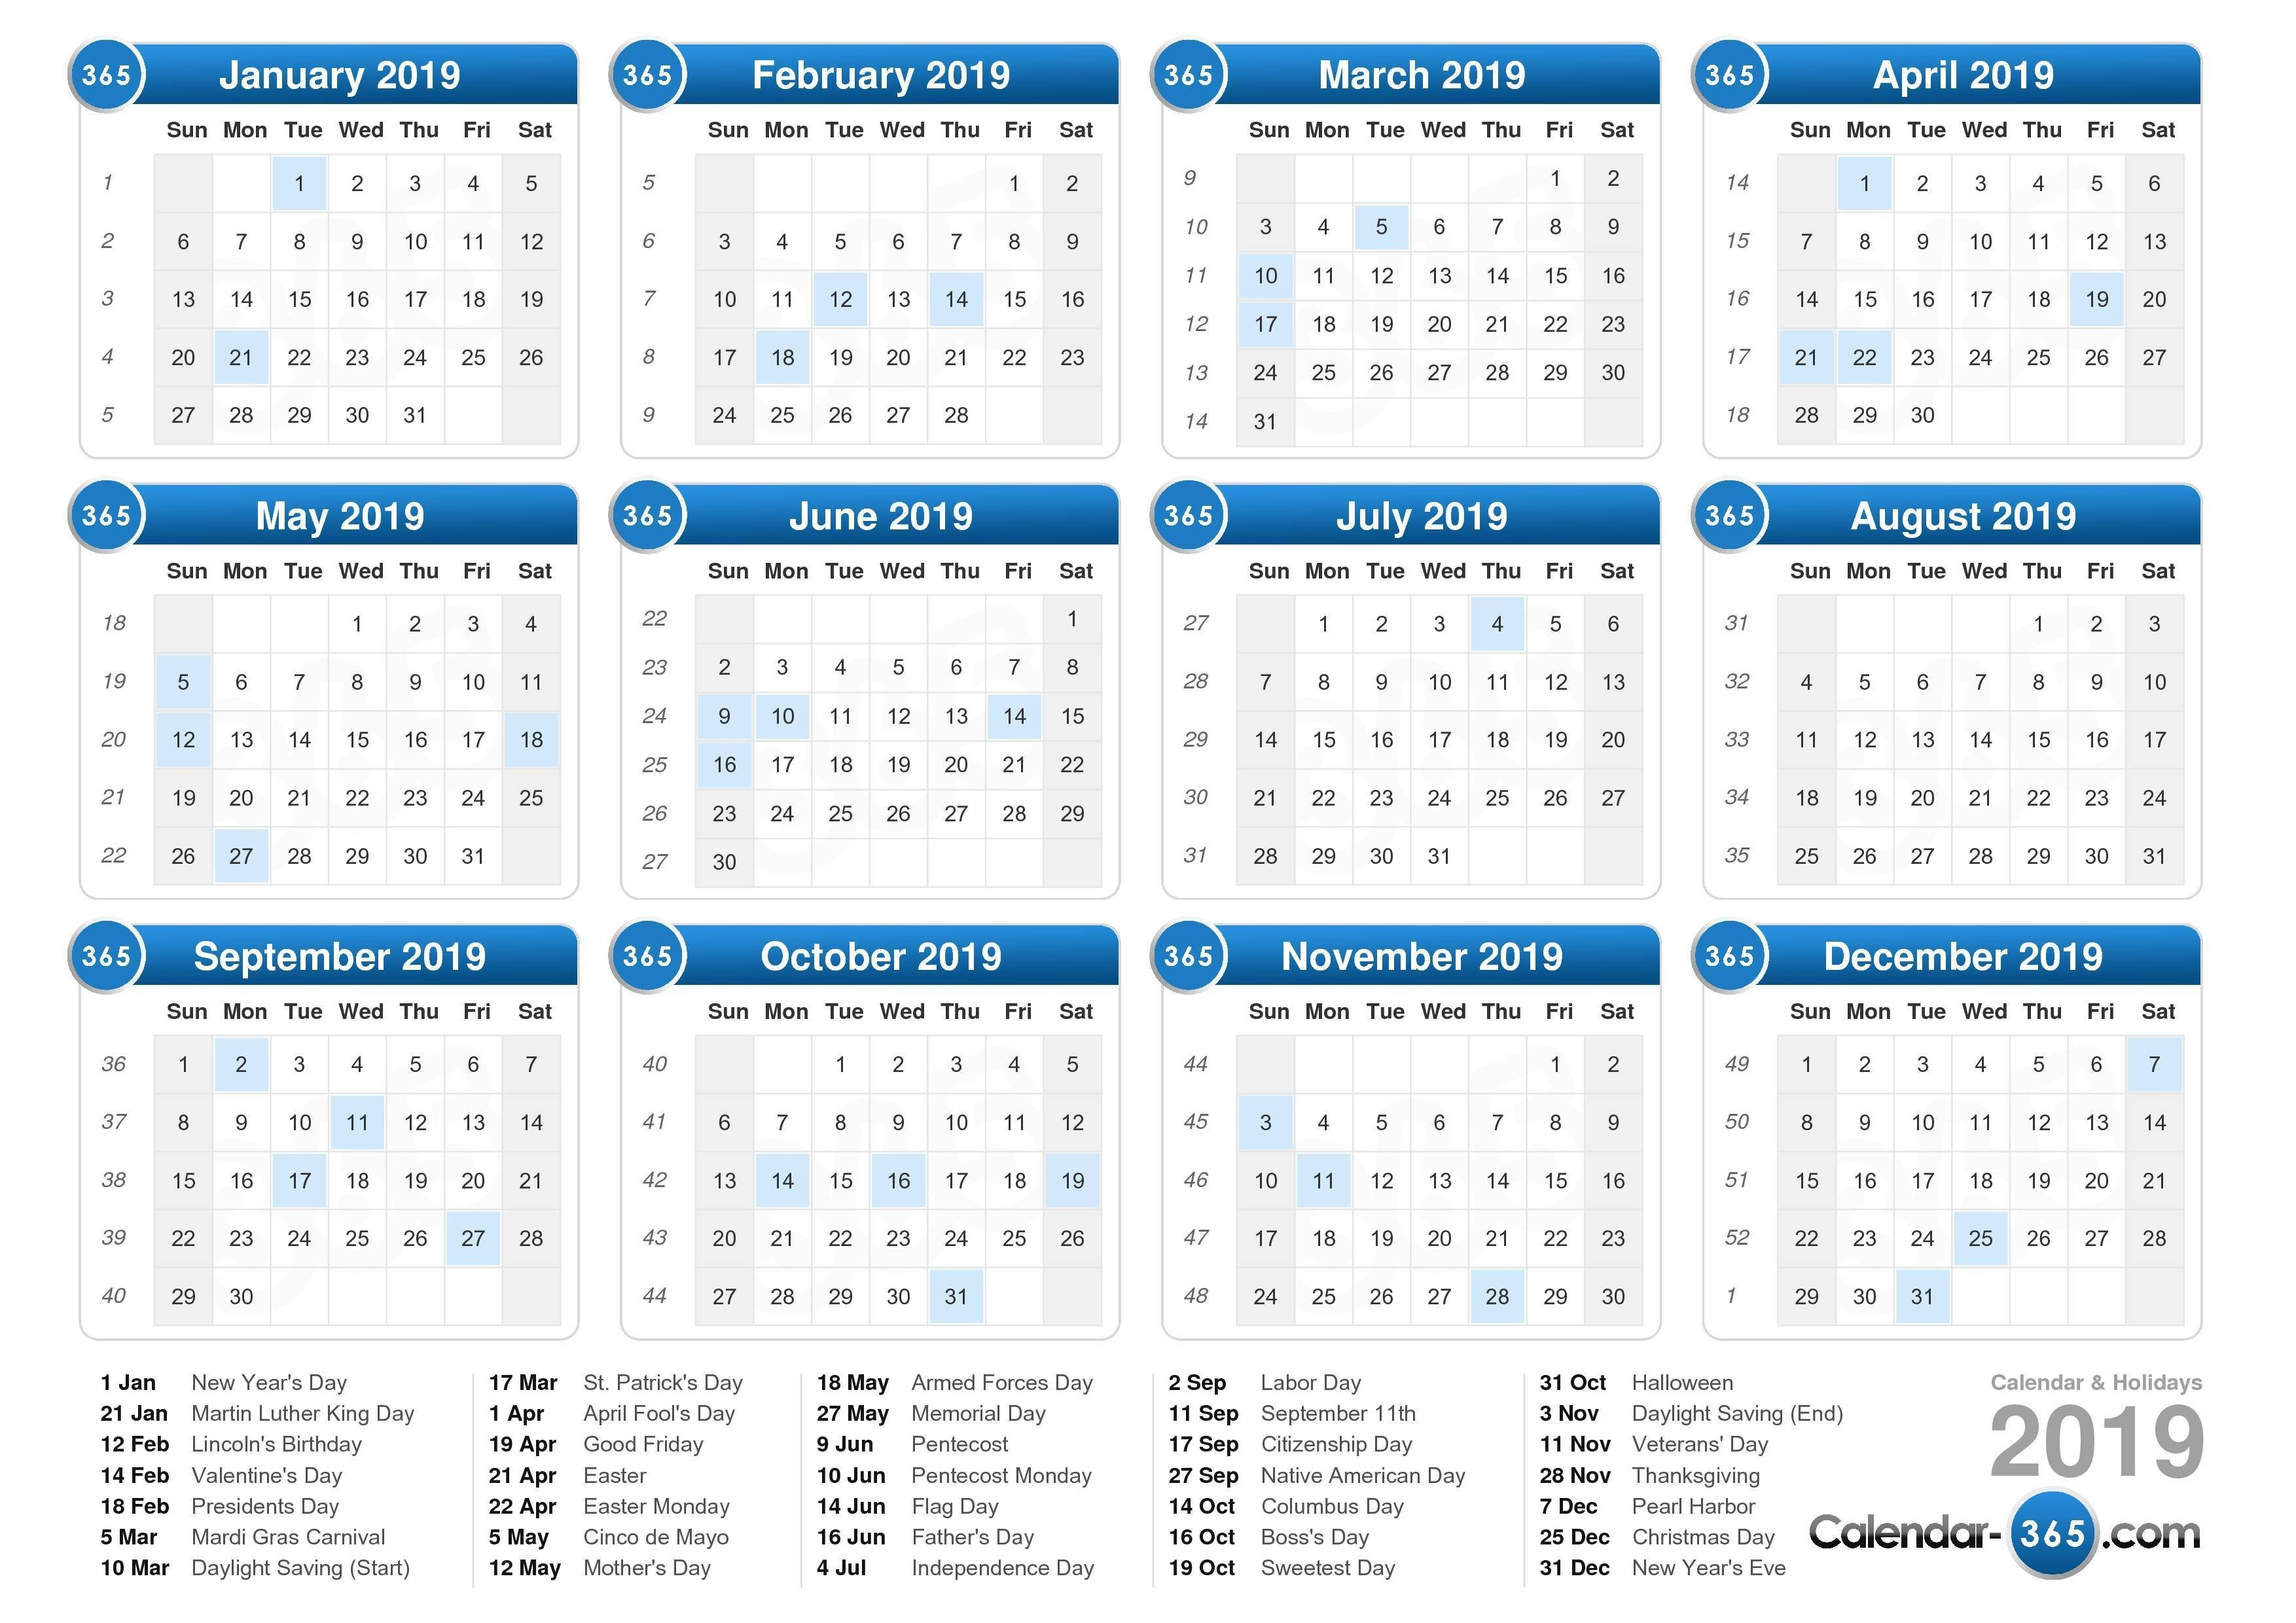 2019 Calendar Calendar 2019 With Pictures